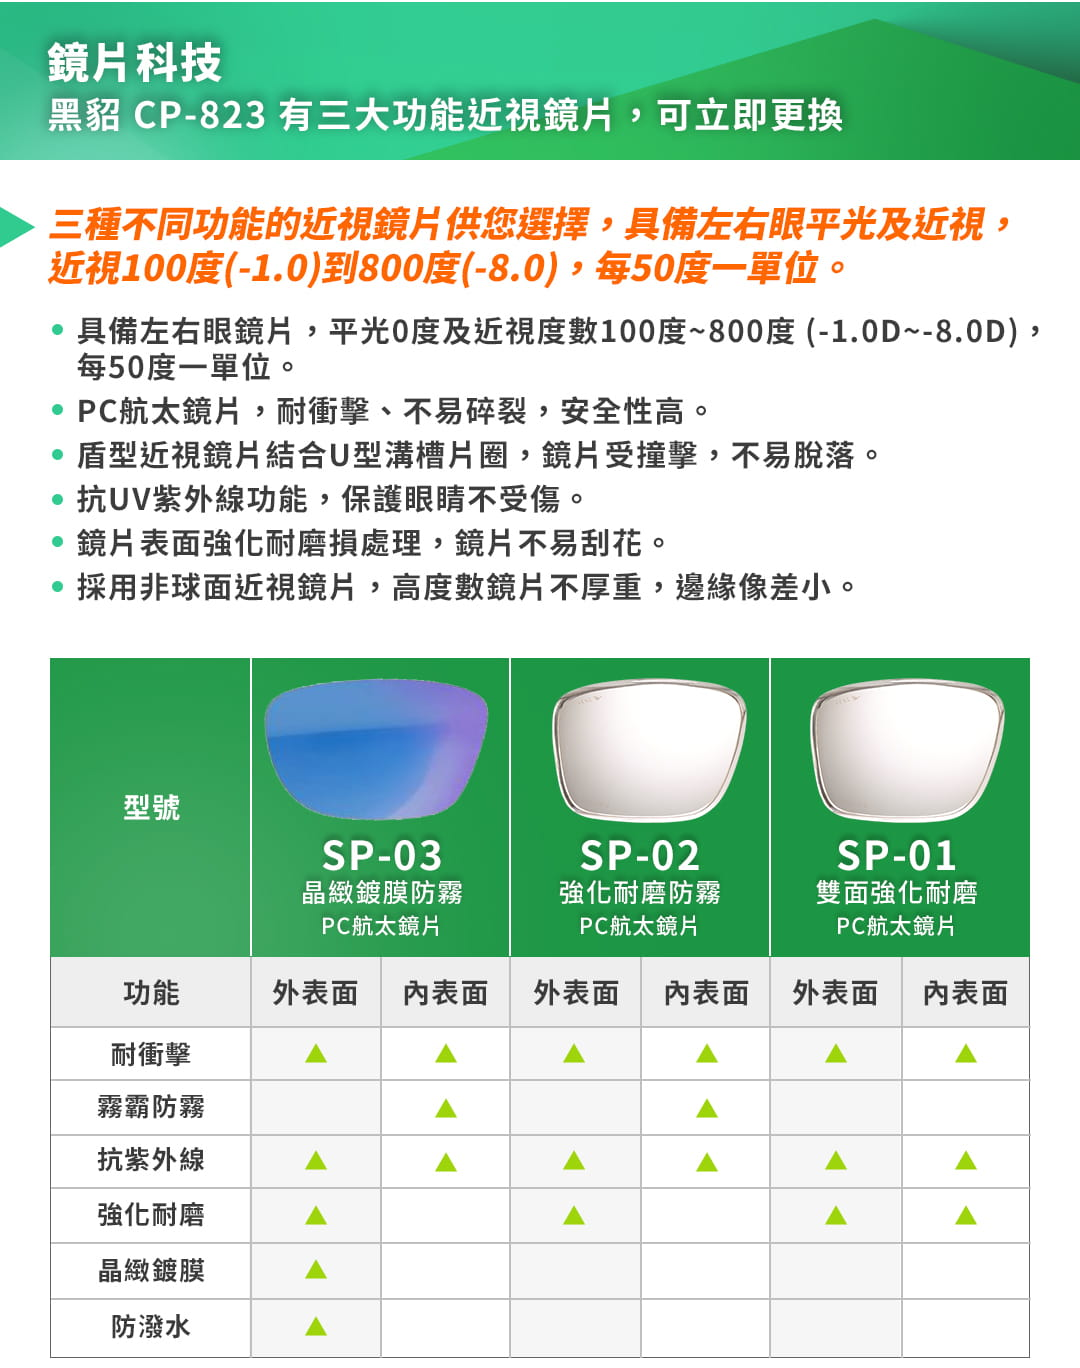 SABLE黑貂光學-專屬球類運動眼鏡CP-823(標準款-無保護墊)+SP-03(平光精緻鍍膜鏡片) 14